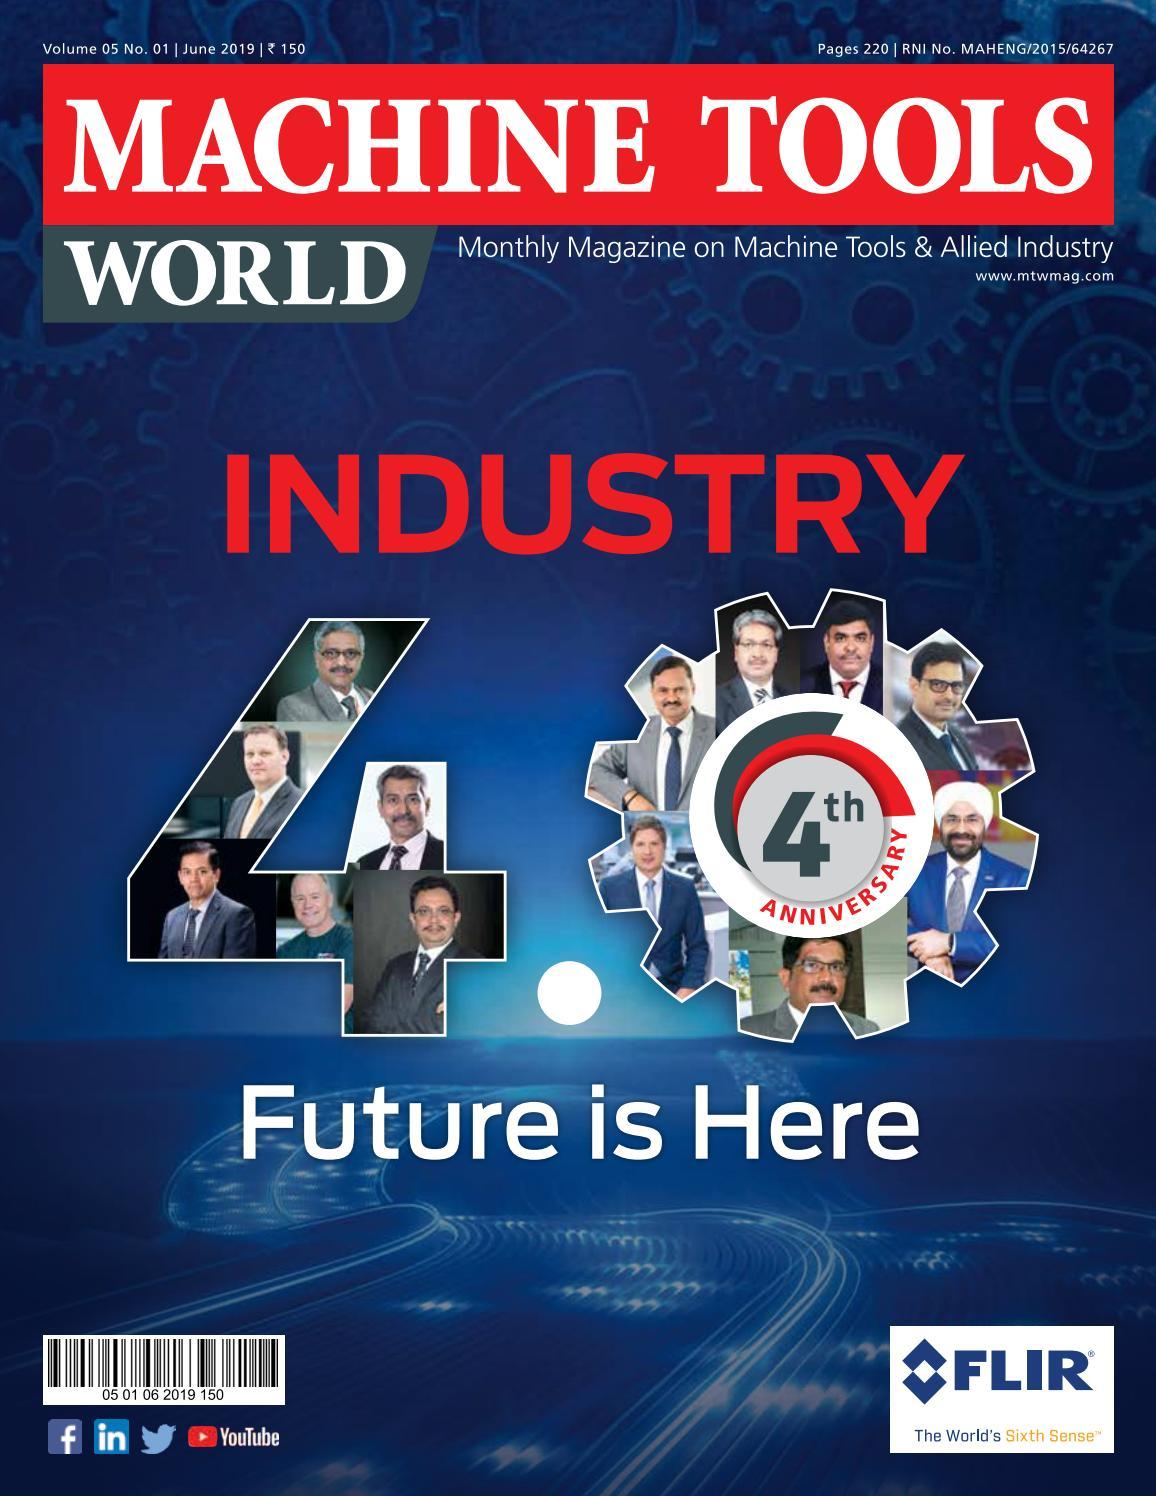 MACHINE TOOLS WORLD - JUNE 2019 by Divya Media Publications